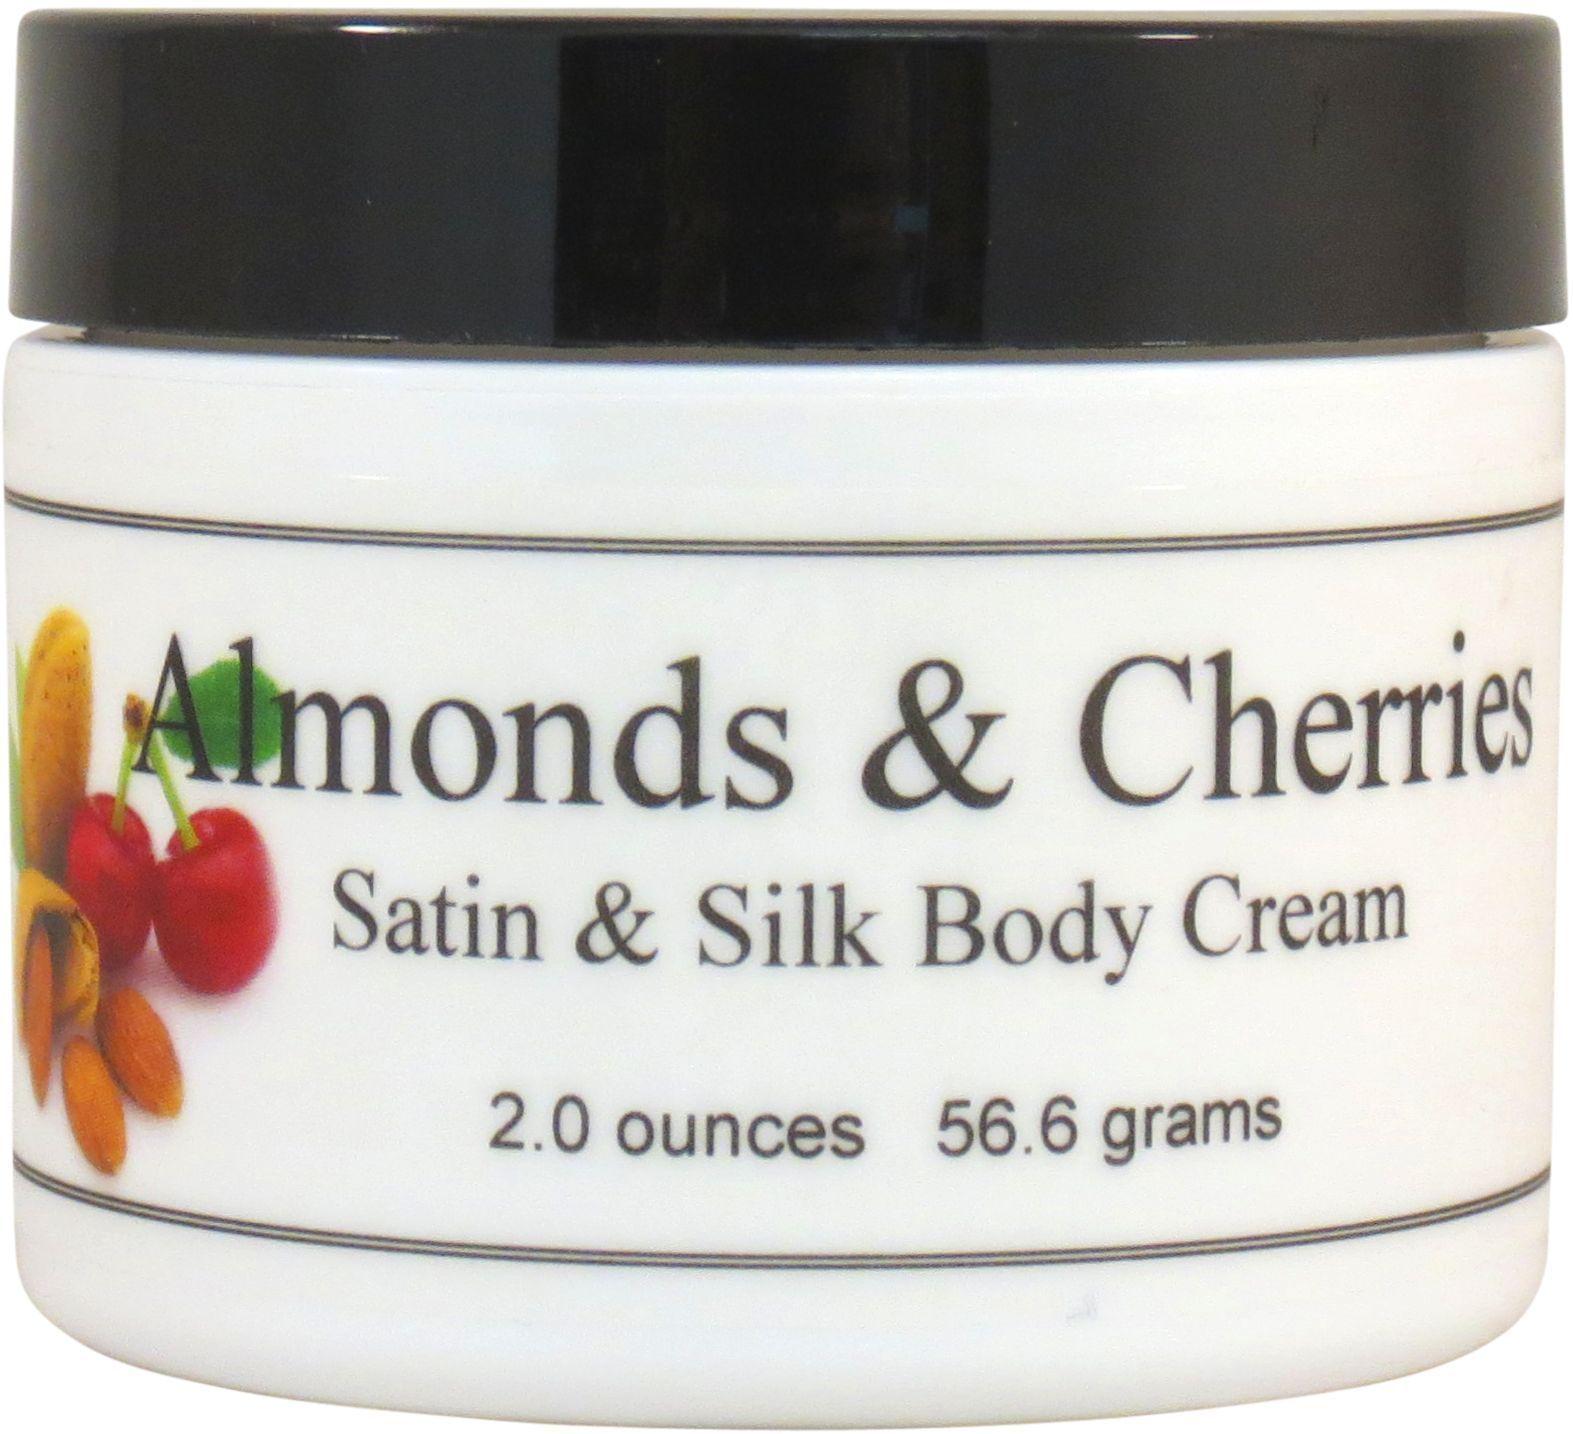 Almonds and Cherries Satin and Silk Cream